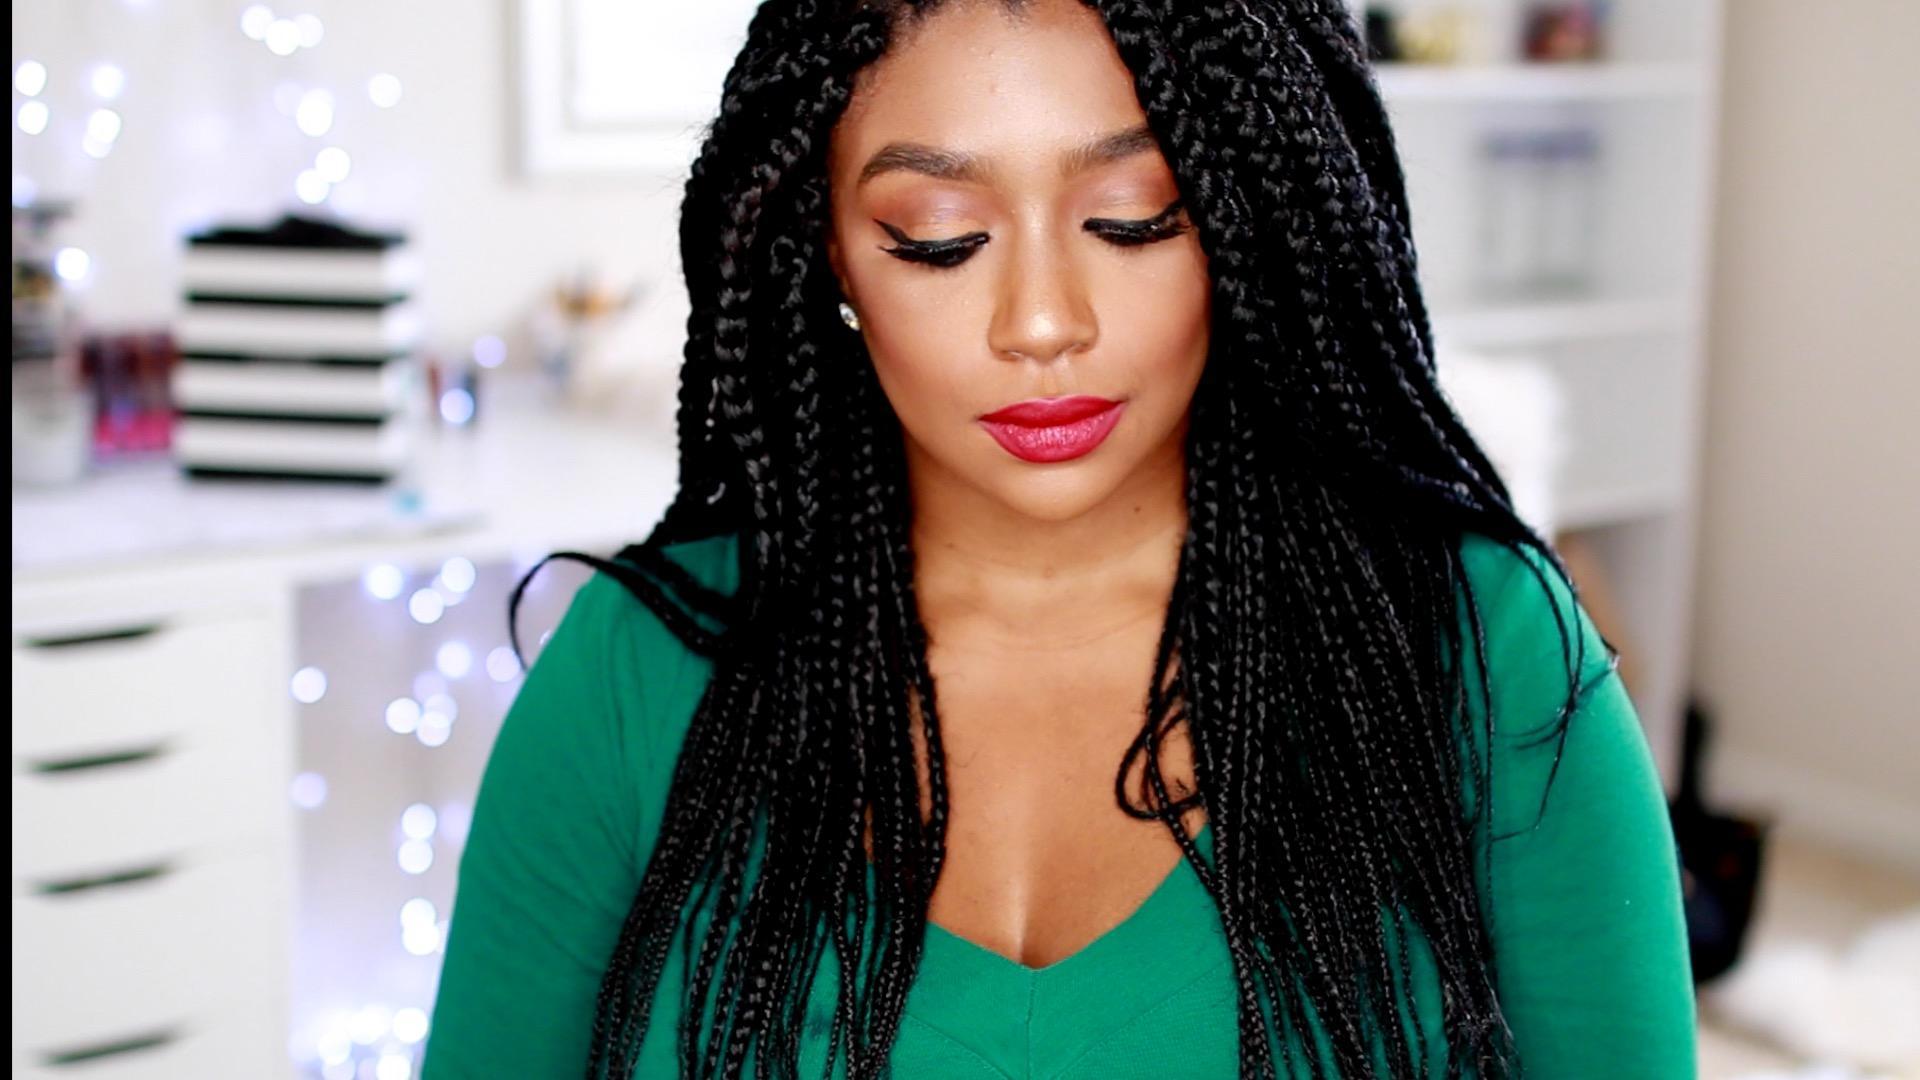 mac lipstick for dark skin